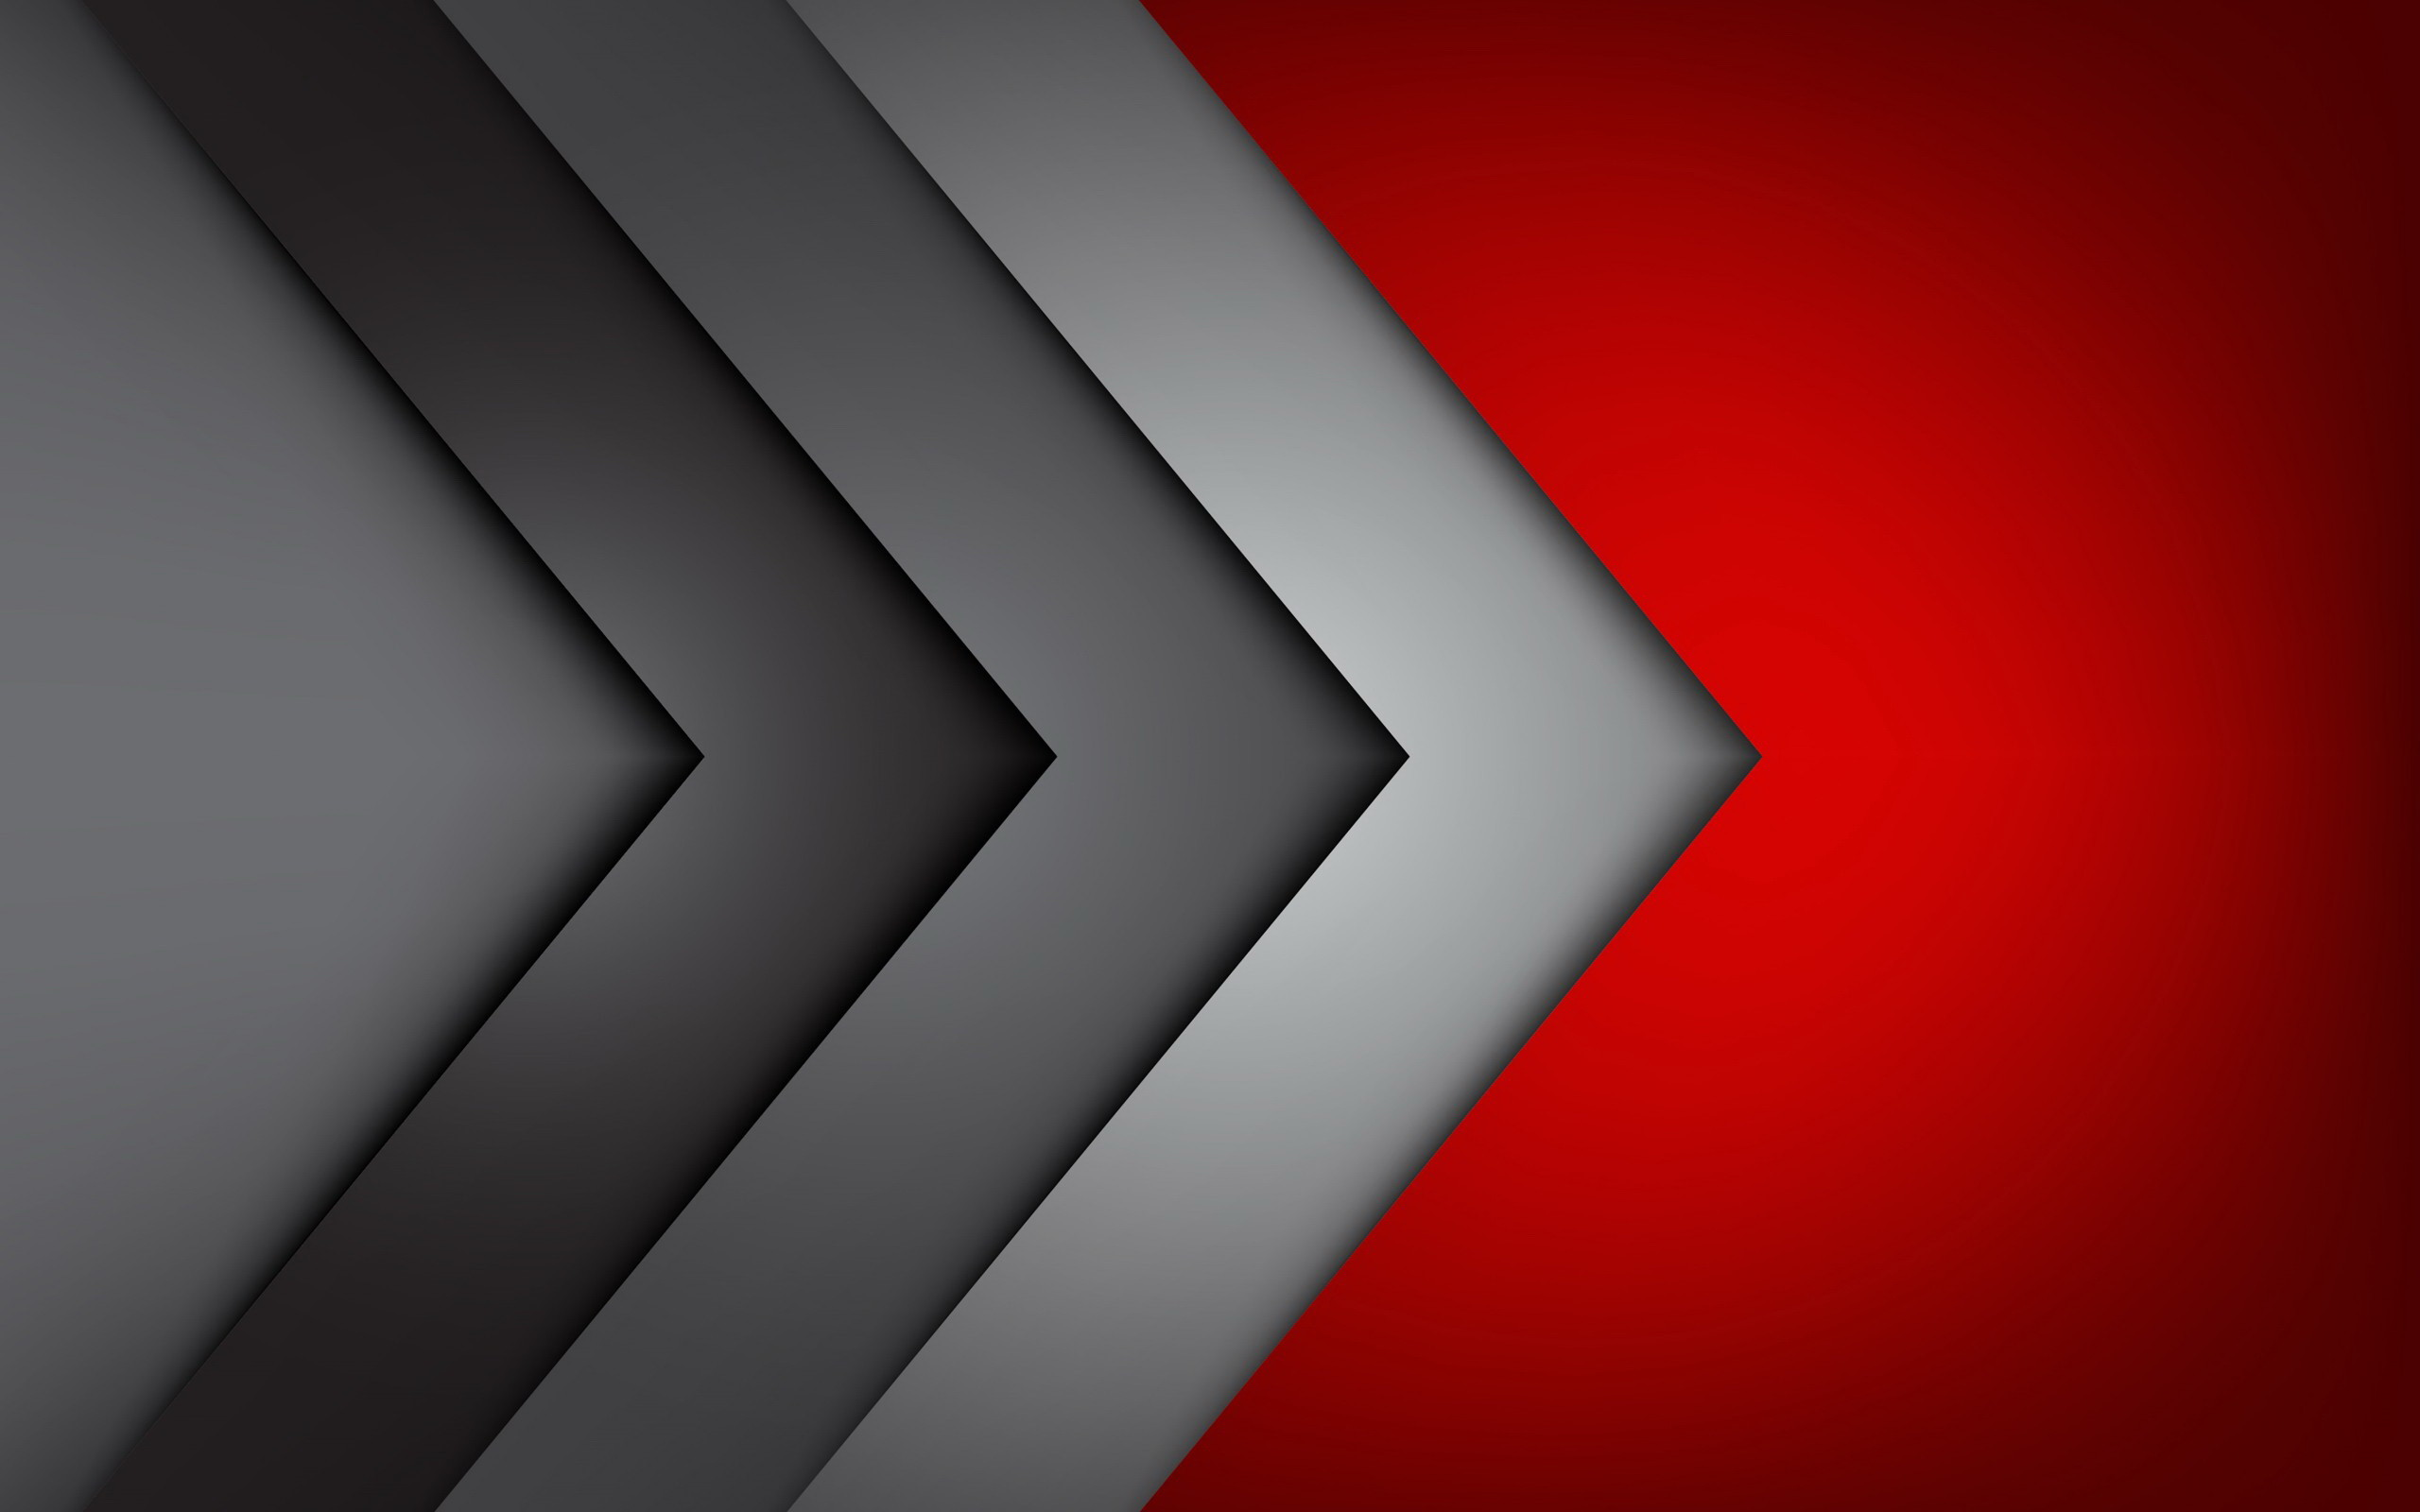 Red Black Grey Wallpaper 67 images